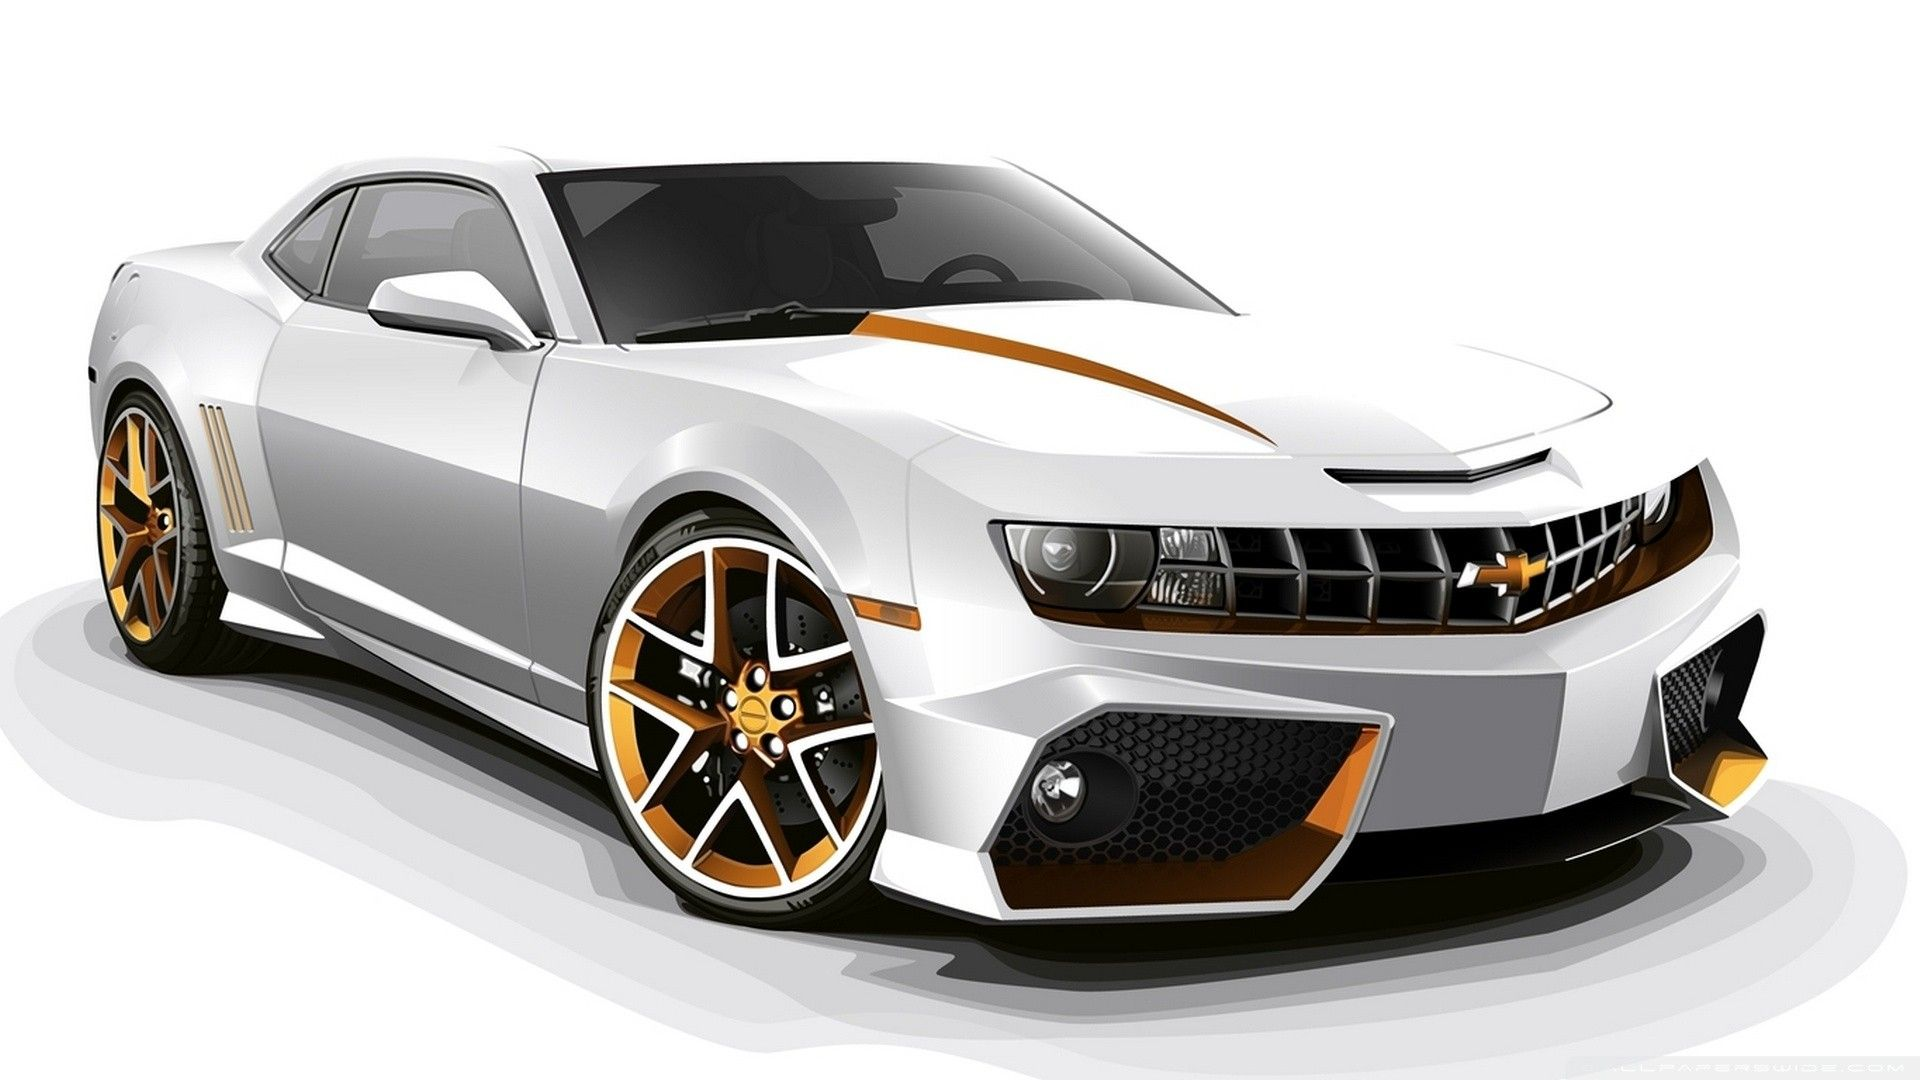 awesome cars chevrolet camaro ss desktop wallpapers arts rh pinterest es